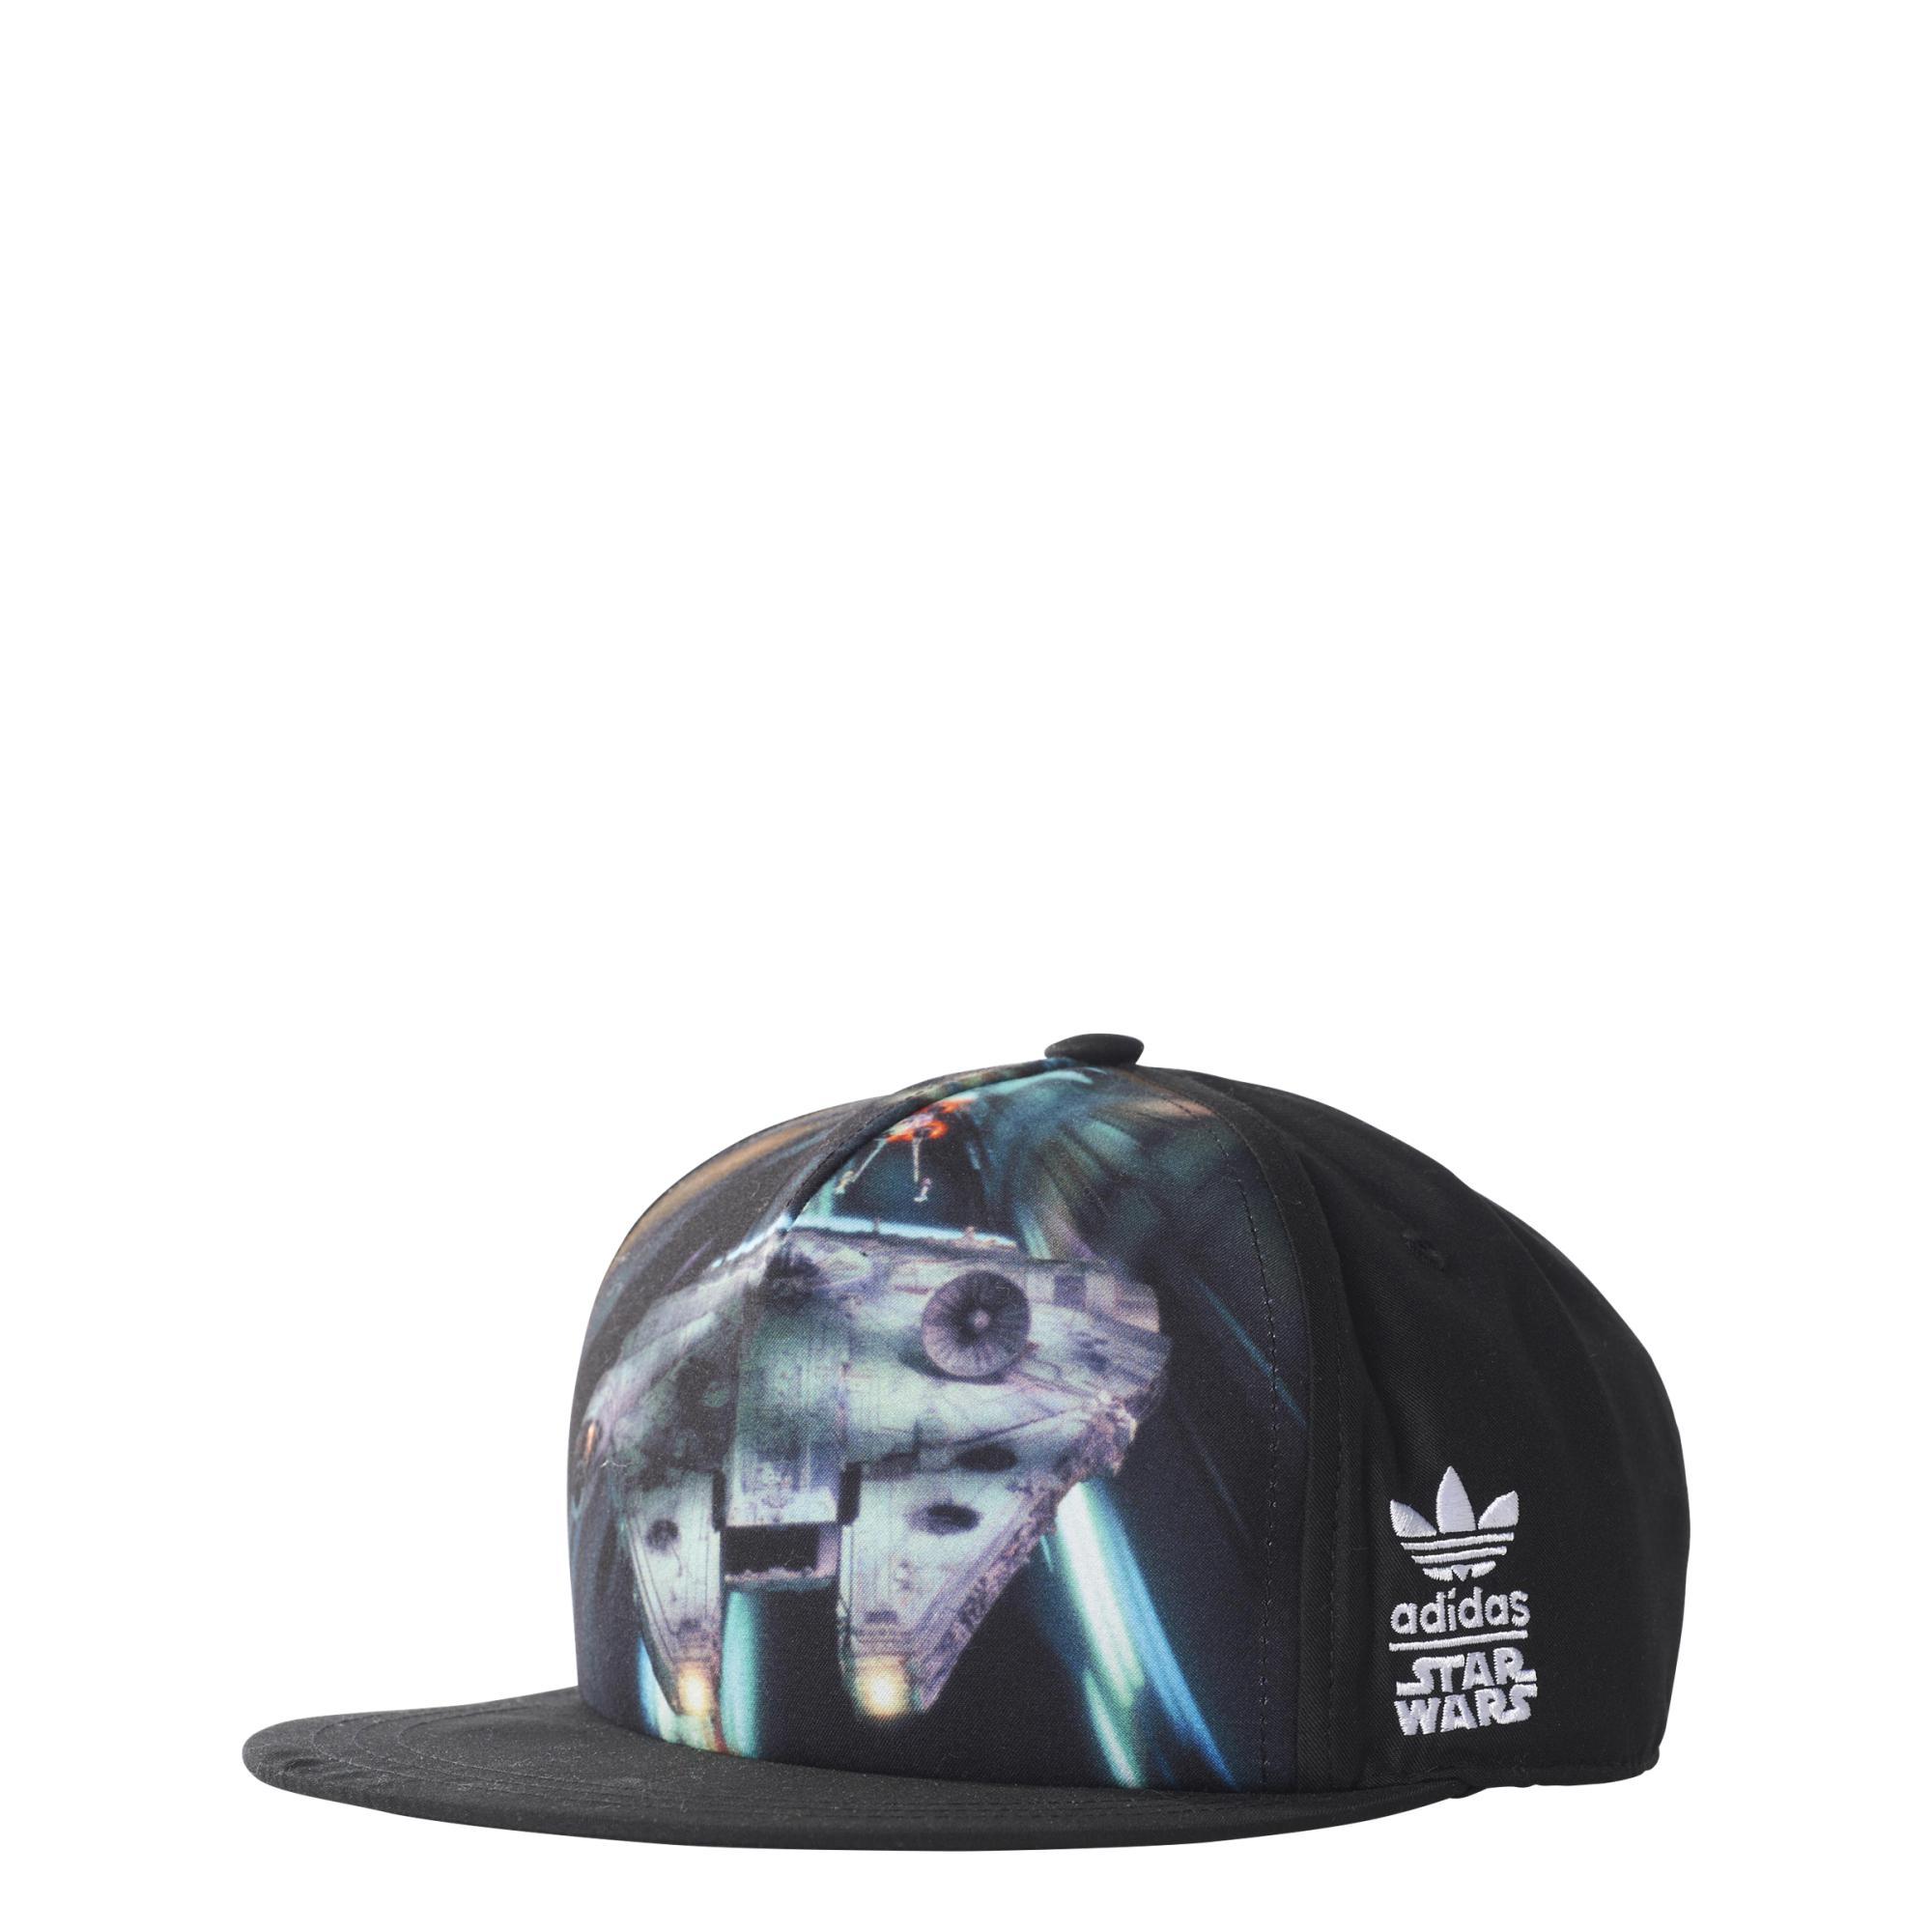 Adidas Originals Junior Gorra Star Wars Millennium Falcon (negro) b78853cf6d2